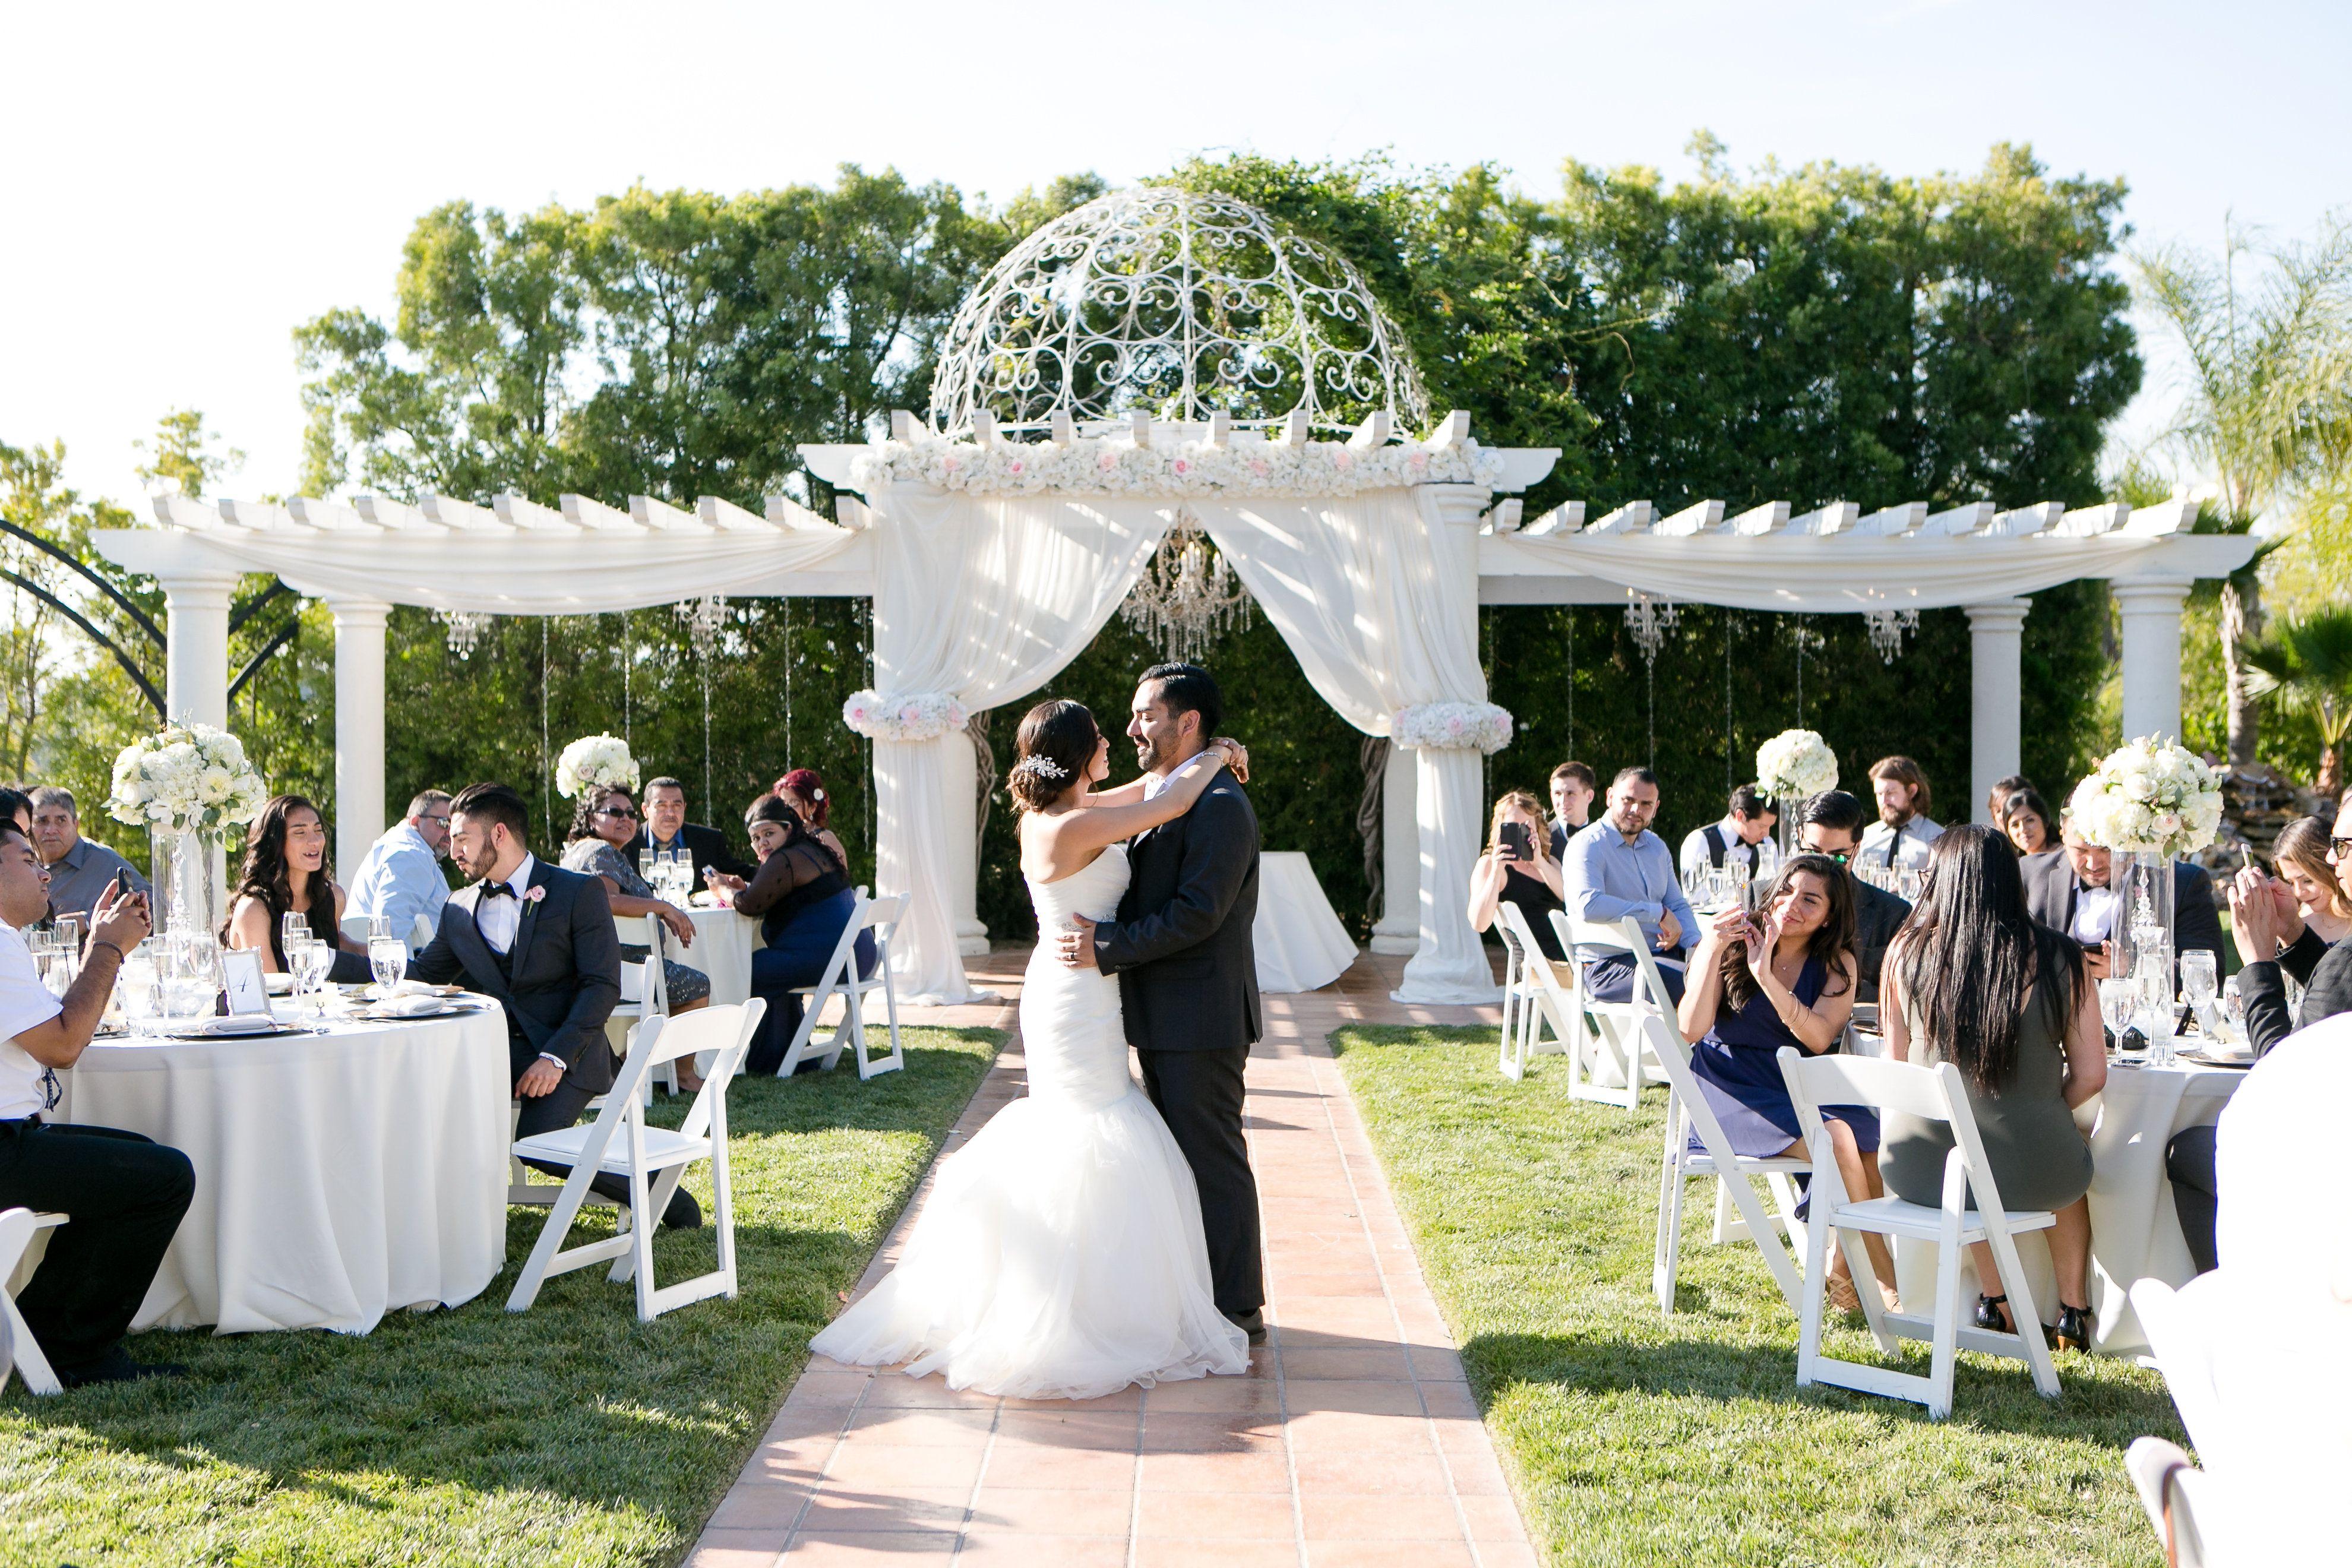 Pin by Villa de Amore California Wedd on First Dance